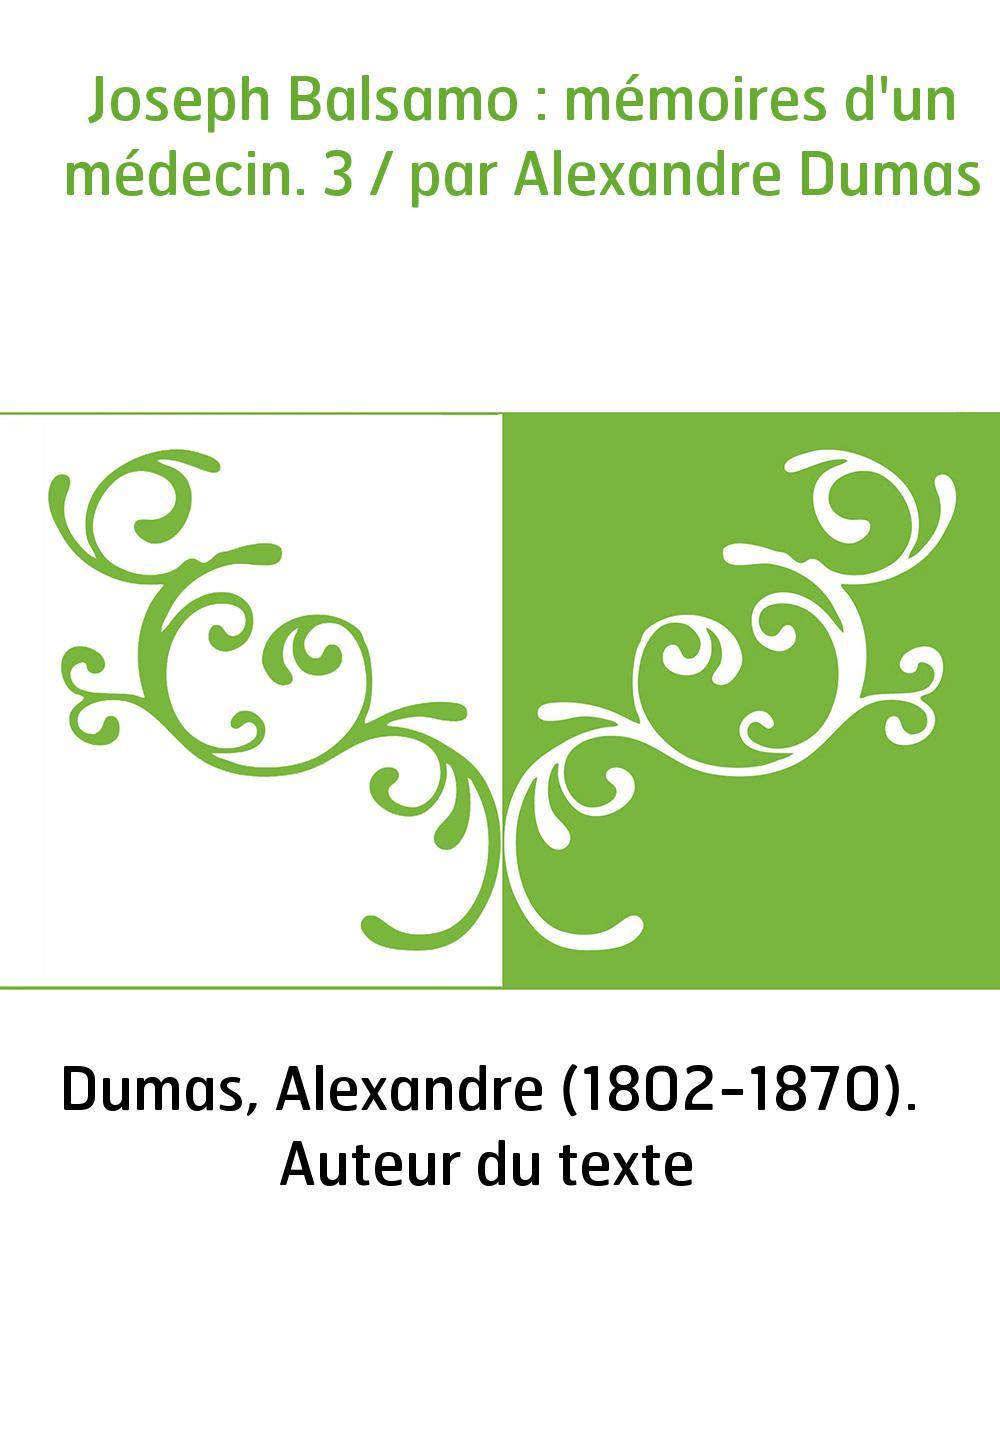 Joseph Balsamo : mémoires d'un médecin. 3 / par Alexandre Dumas